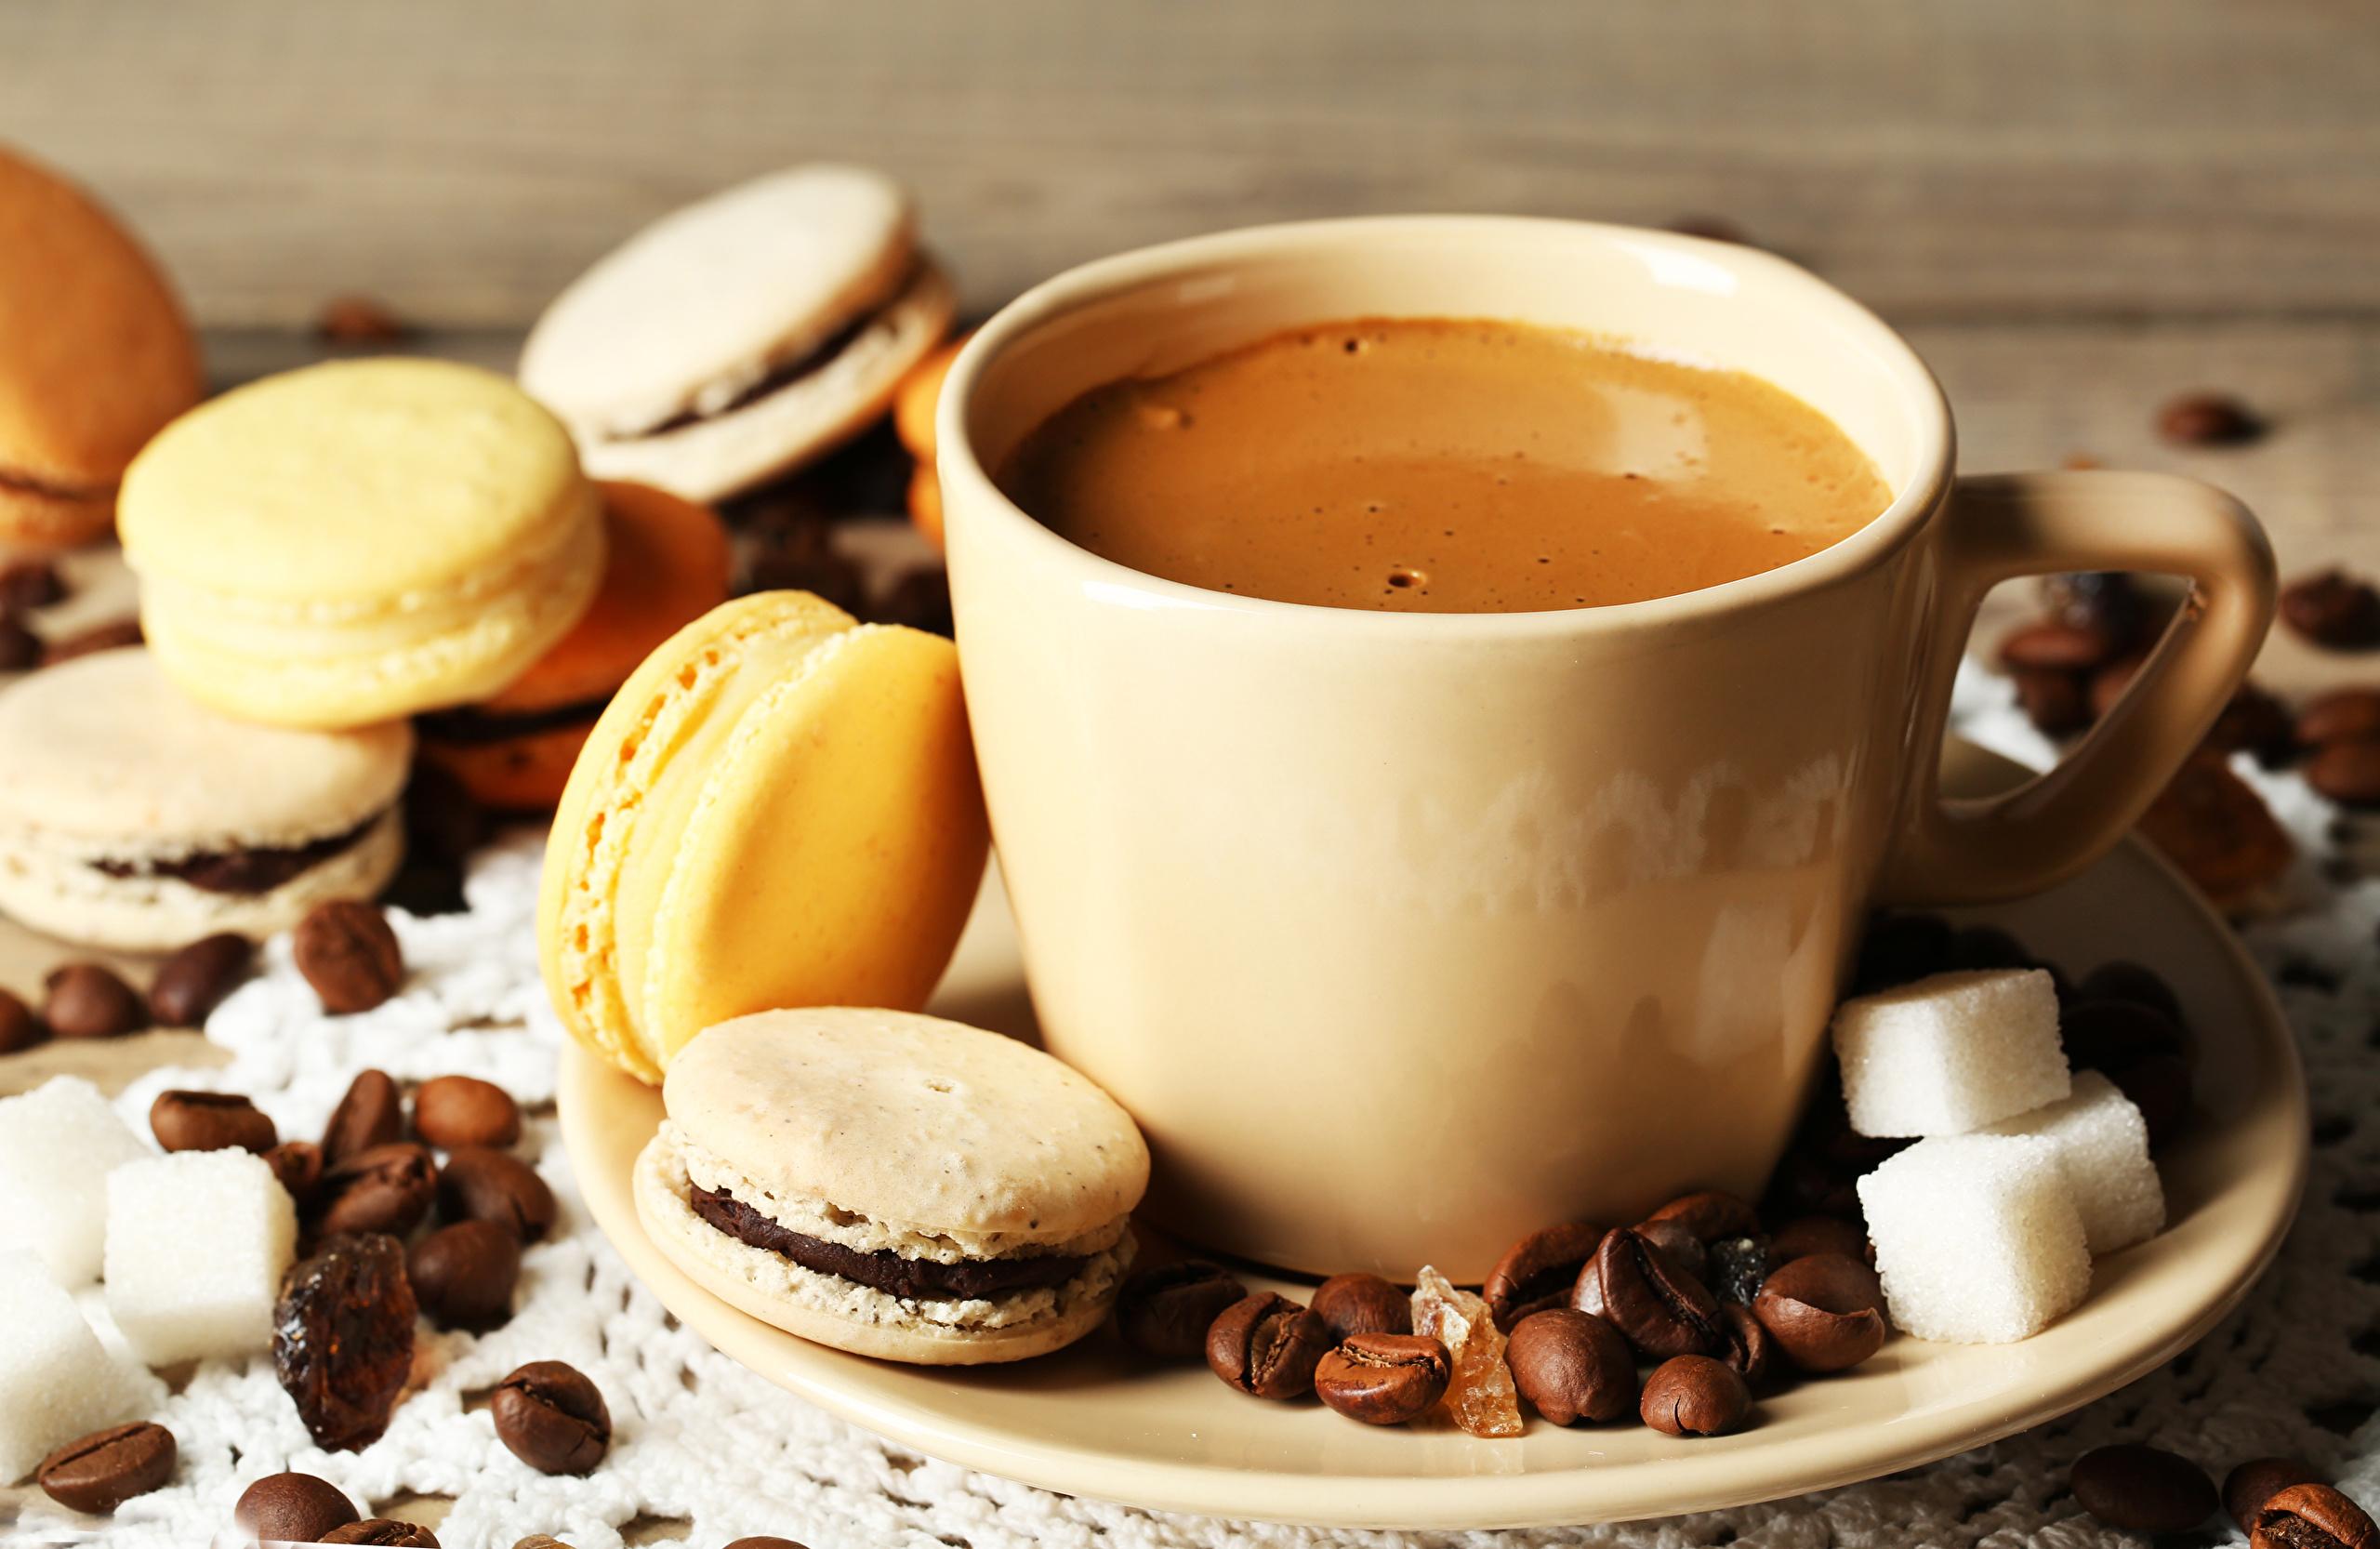 https://s1.1zoom.ru/big7/494/Coffee_Cup_Macaron_Grain_449336.jpg